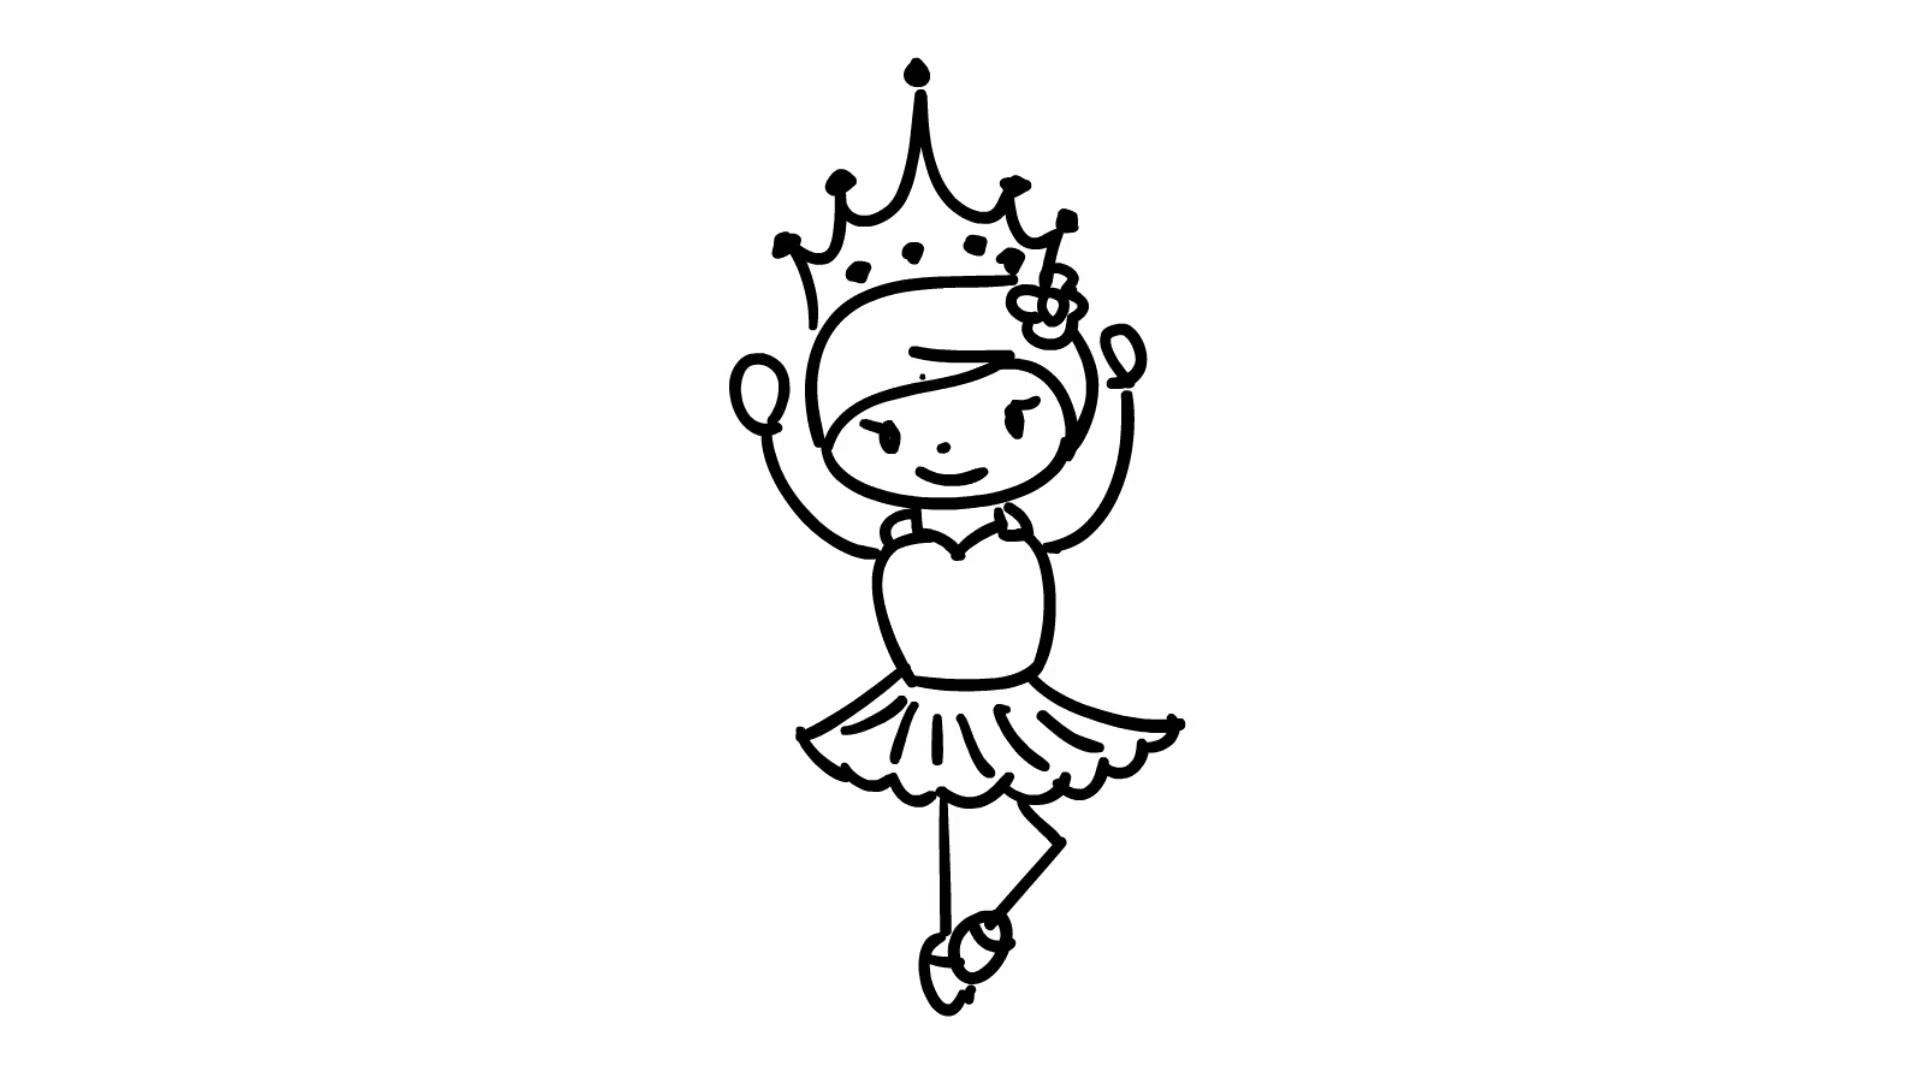 1920x1080 Christmas Kids Wearing Fancy Dress Line Drawing Illustration